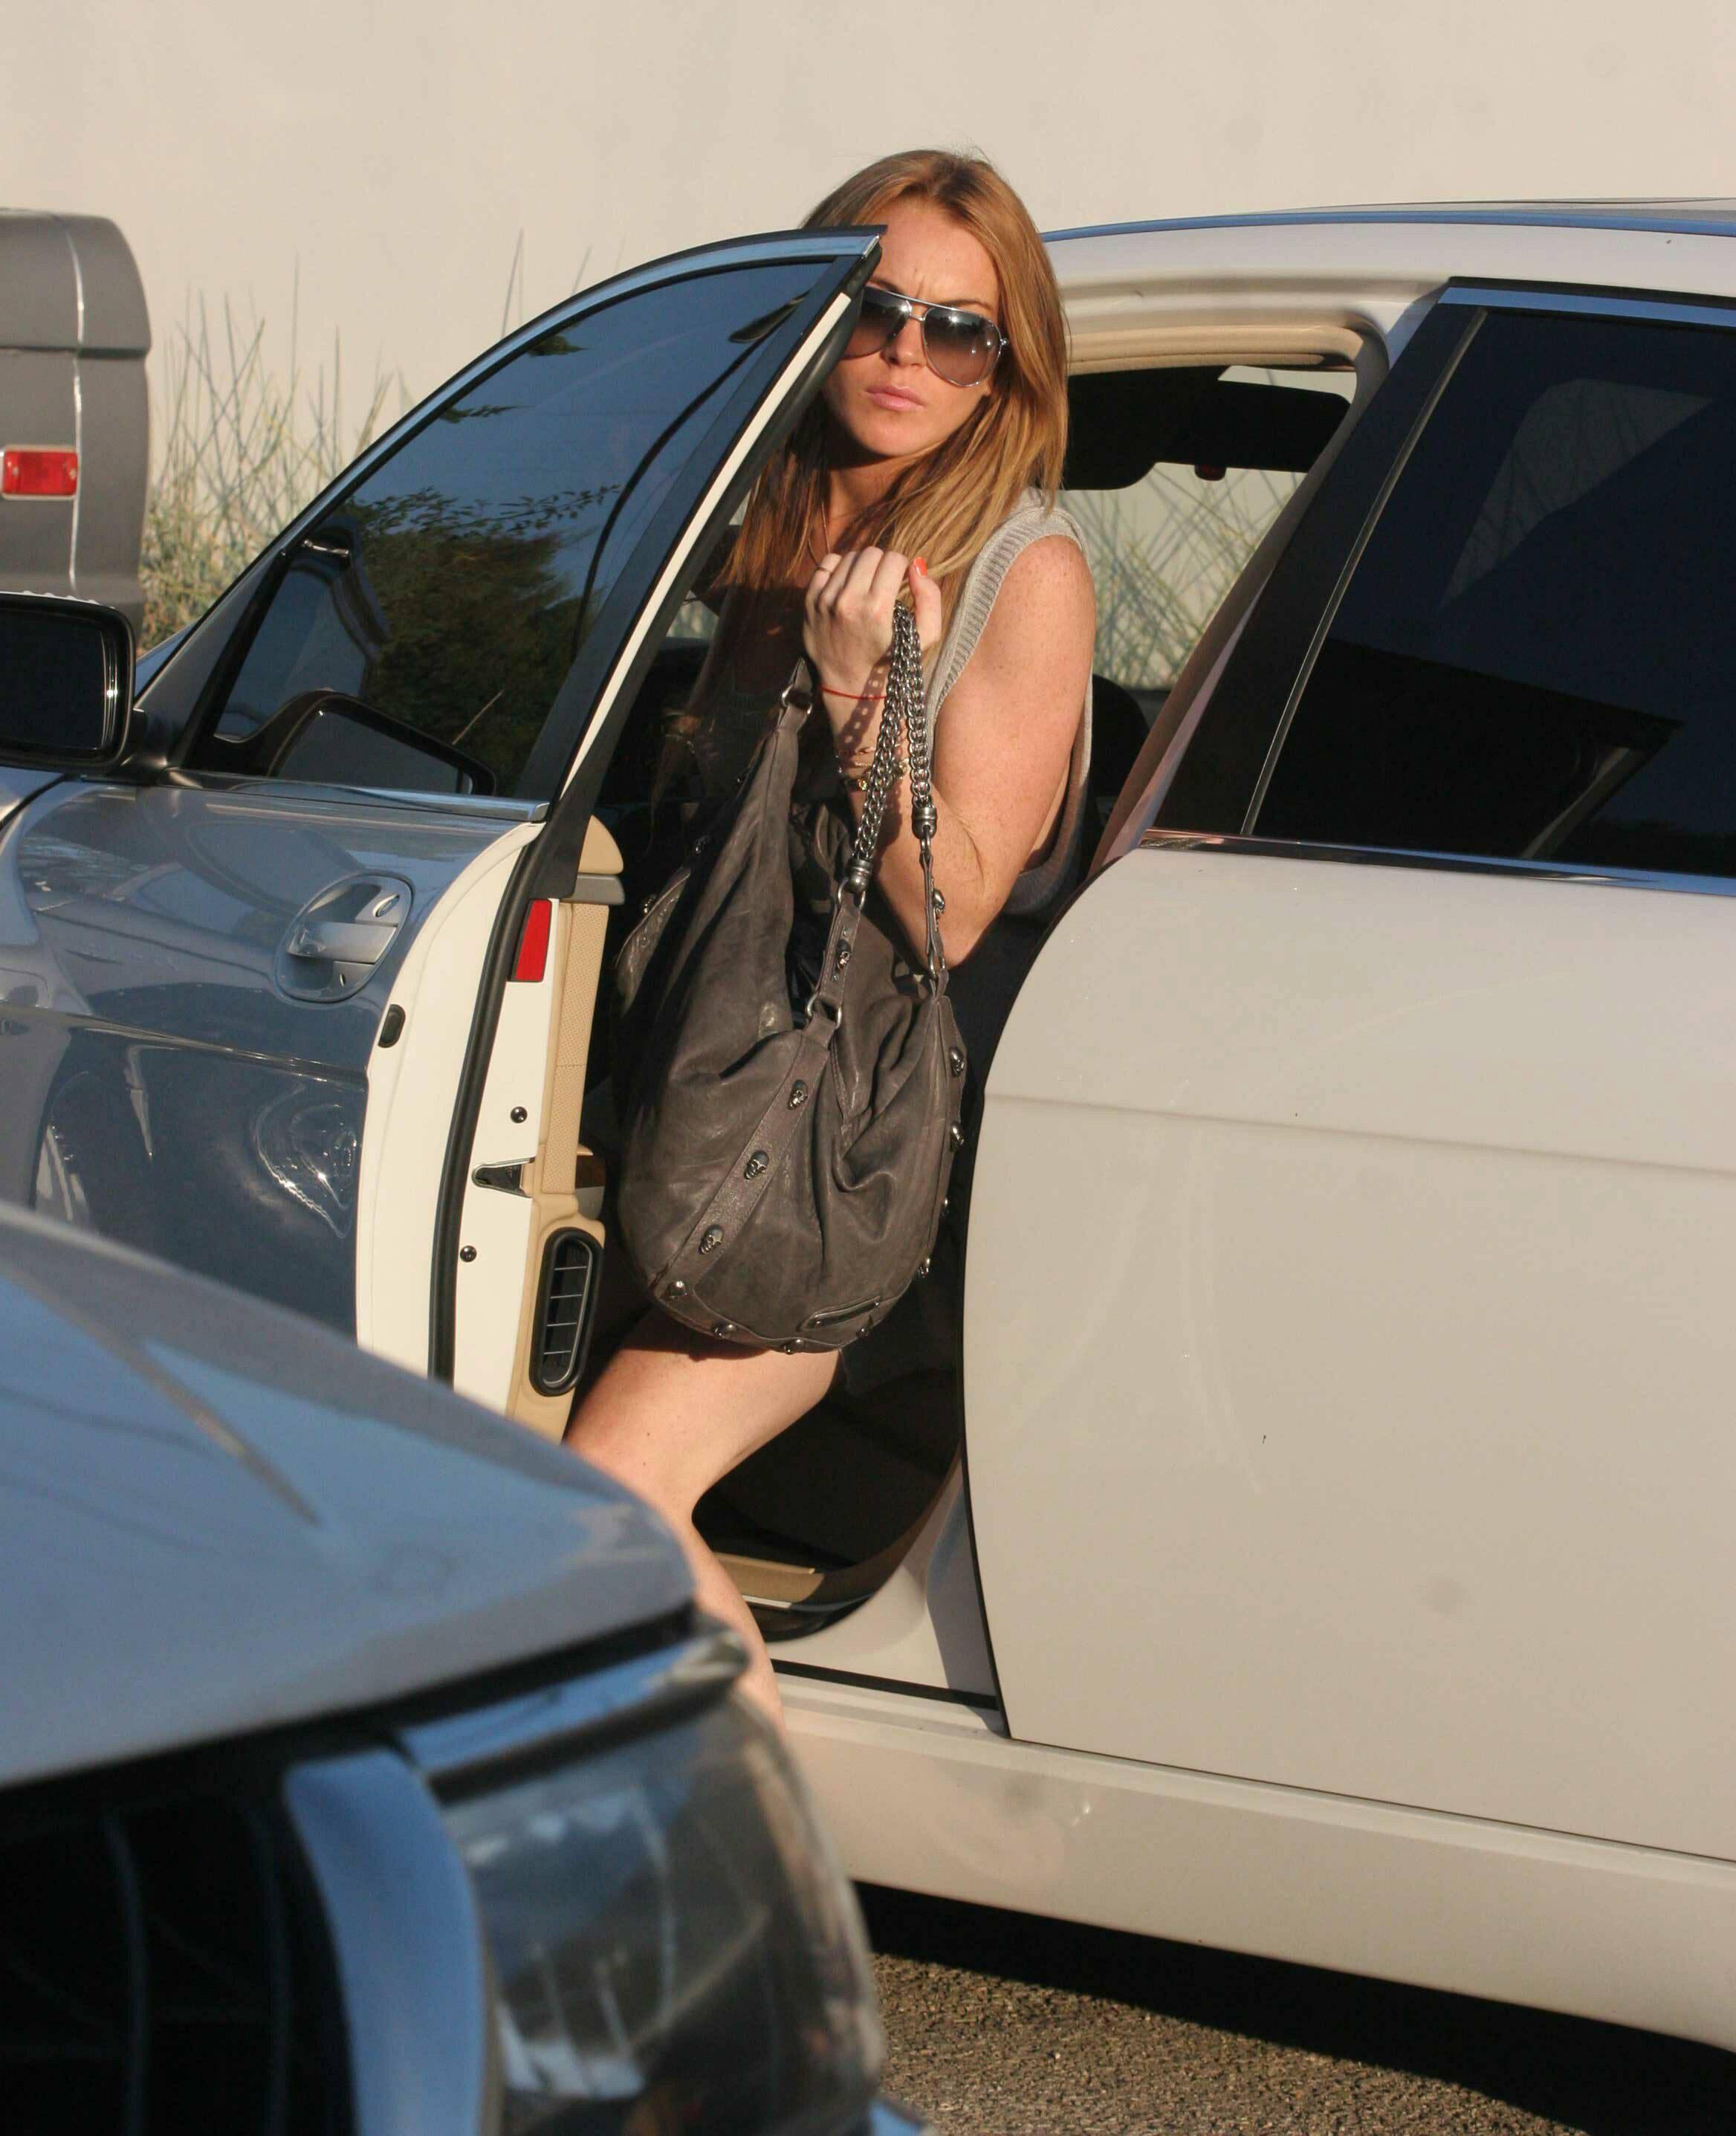 99926_3564969_Lindsay_Lohan_flashes_a_bit_too_much_skin_while_ou3564969_Lindsay_Lohan_flashes_a_bi_122_463lo.jpg